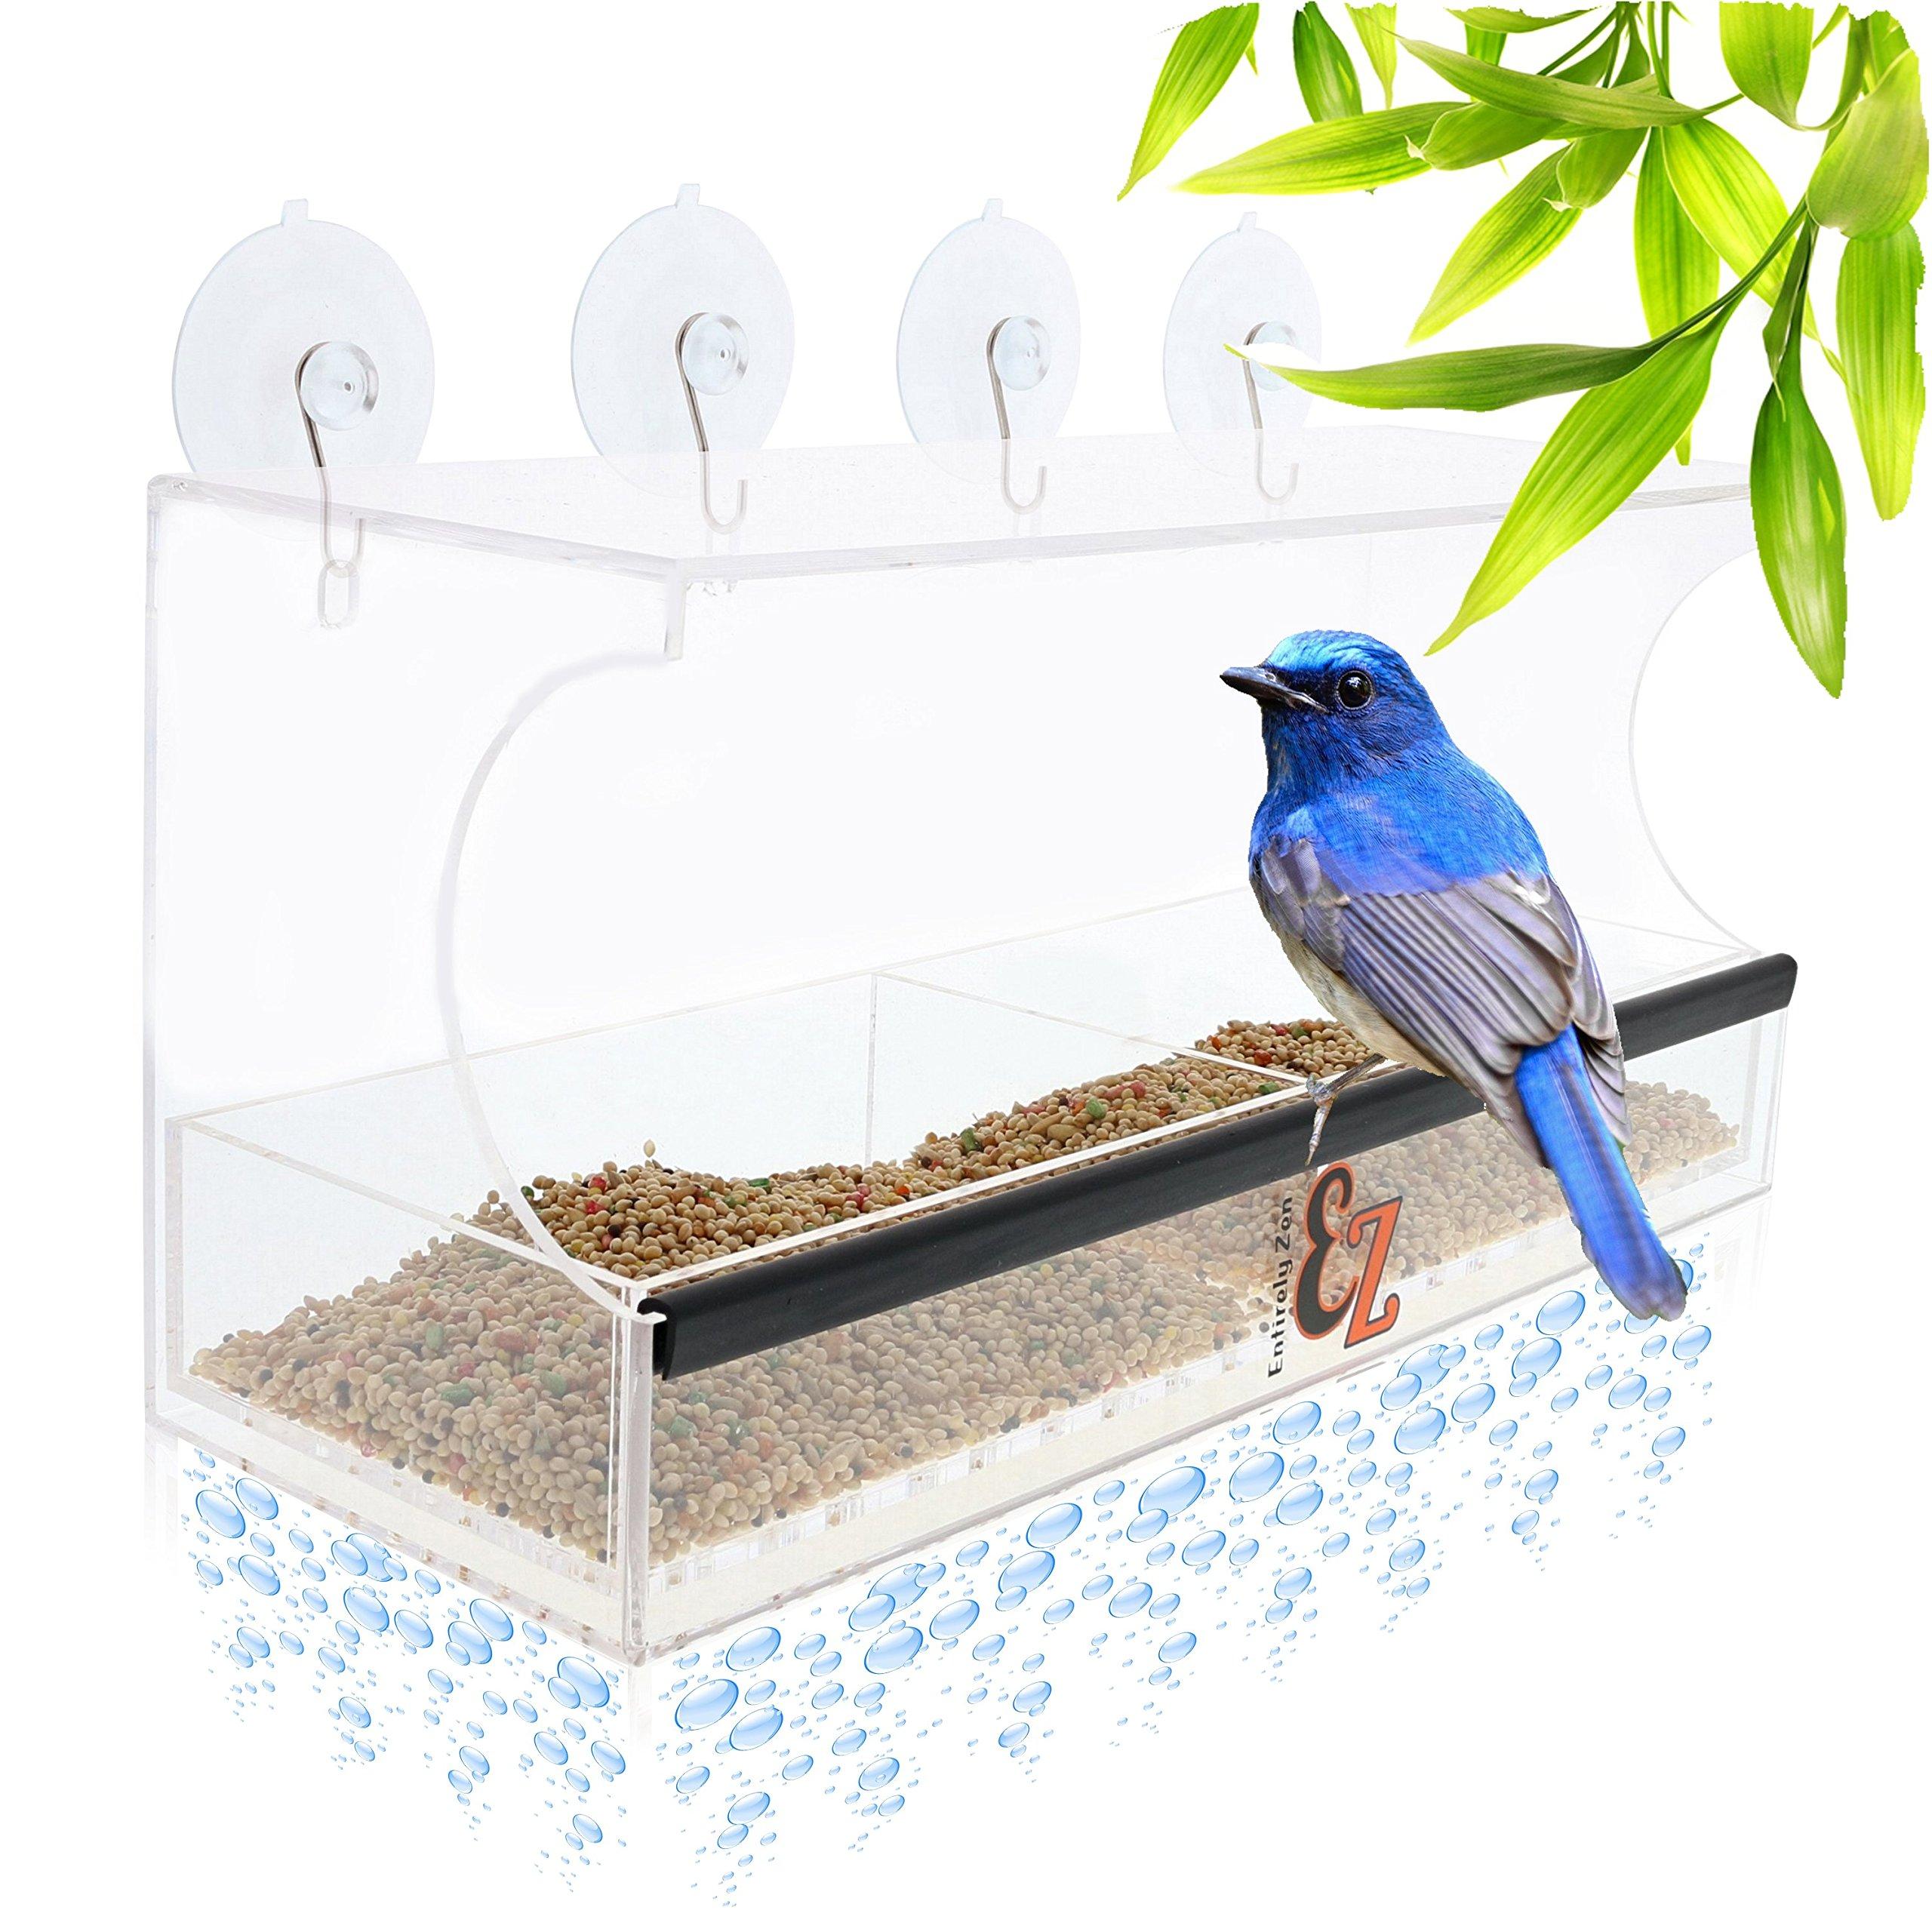 SUPERIOR Window Bird Feeder by Entirely Zen Includes Bonus Mirror Film, 5 Super Strong Suction Cups That Don't Fall; 100% Clear Outside Wild Bird Viewing, Cardinal, Bluebird, Large Bird Feeder